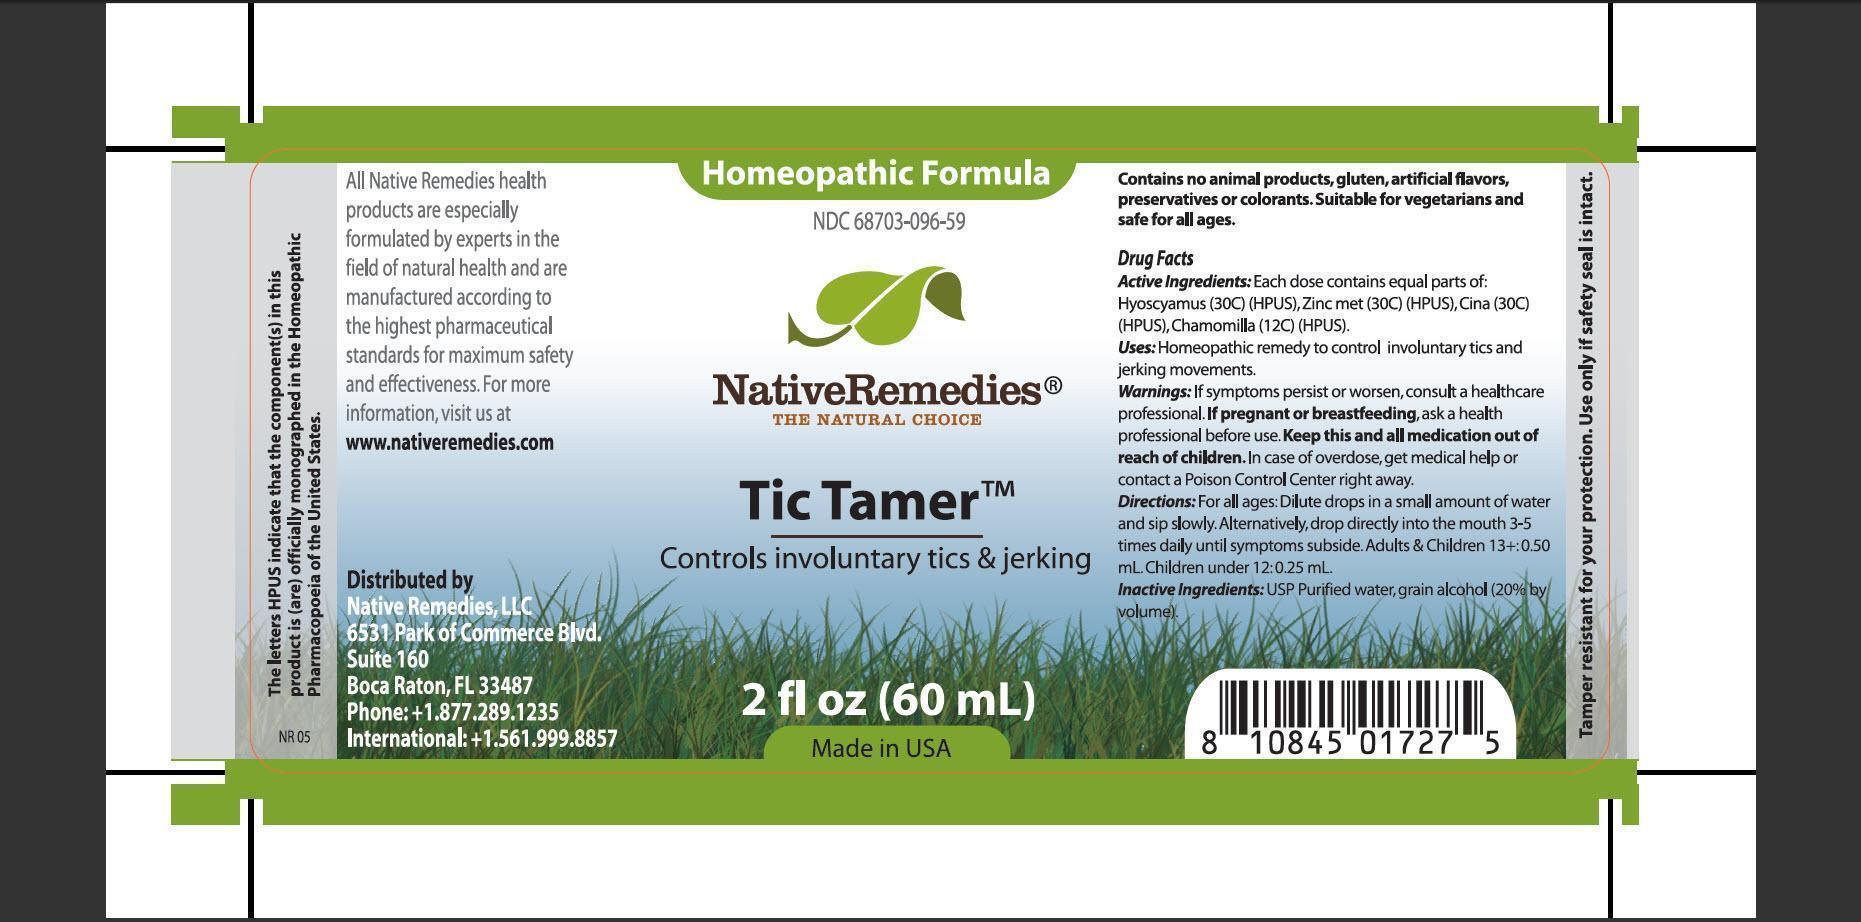 Tic Tamer (Hyoscyamus, Zinc Met, Cina, Chamomilla) Tincture [Native Remedies, Llc]